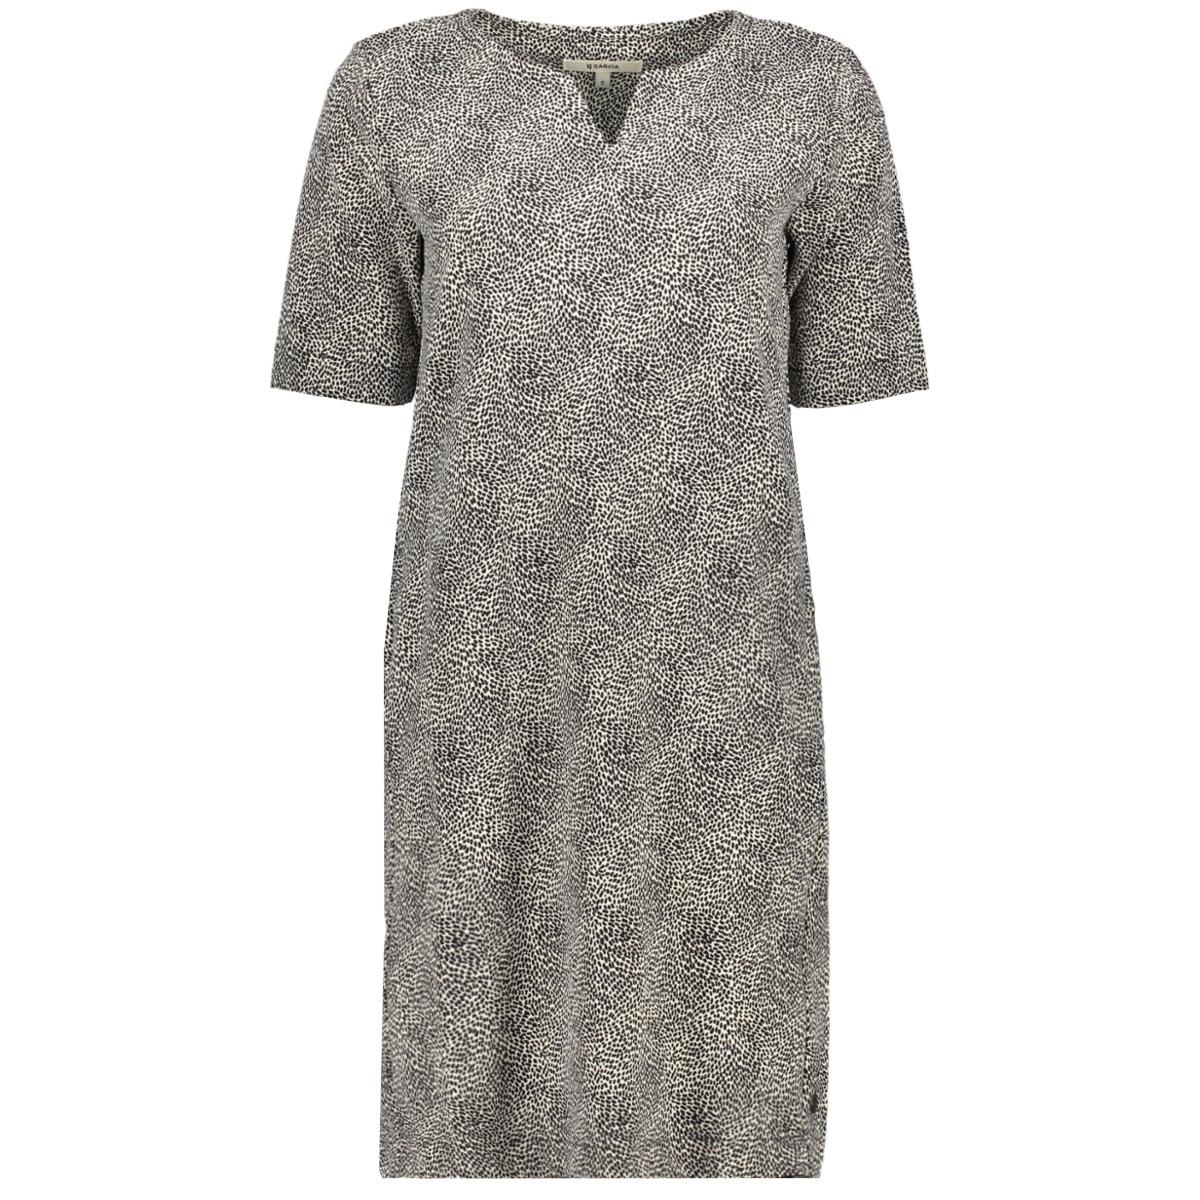 jurk met all over print g90085 garcia jurk 2389 soft kit